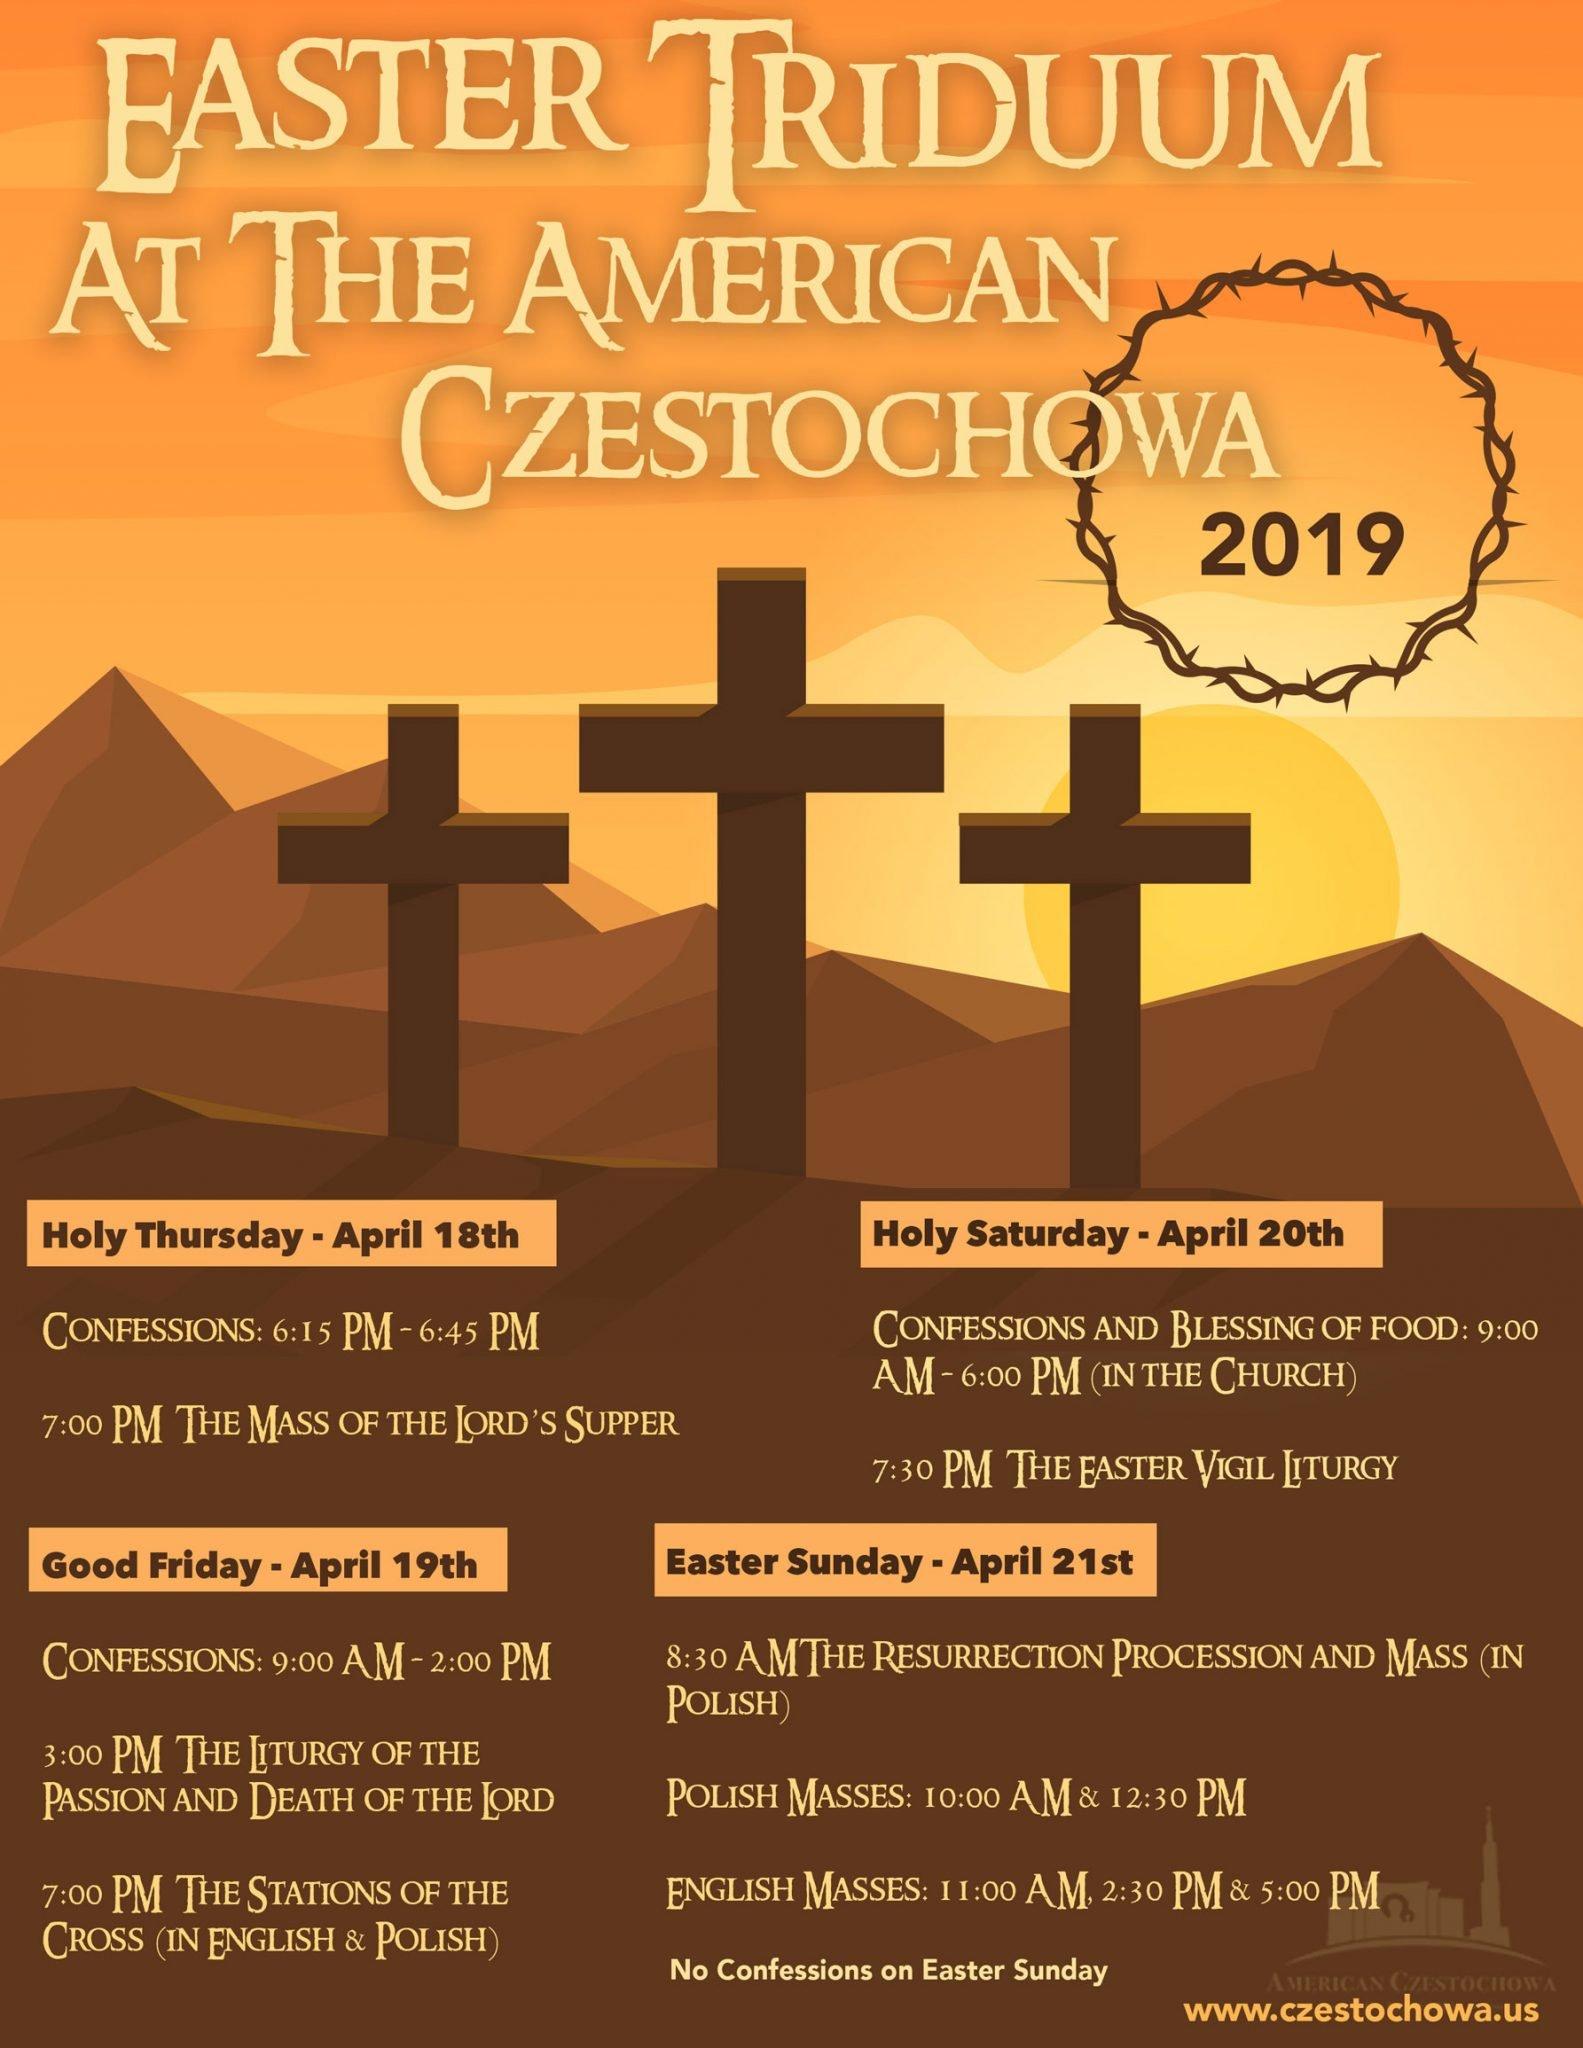 Invitation for the Easter Triduum